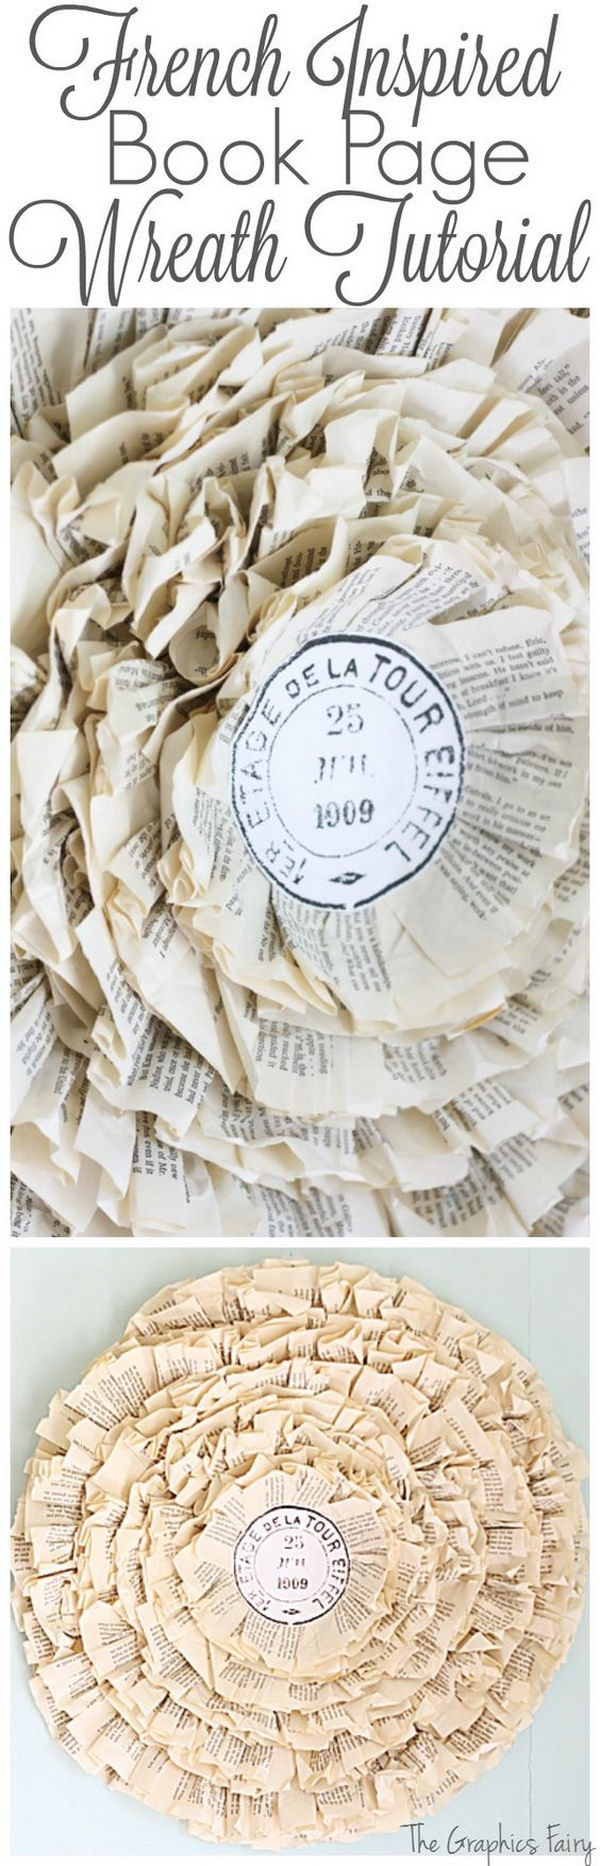 Paris Postmark Book Page Wreath